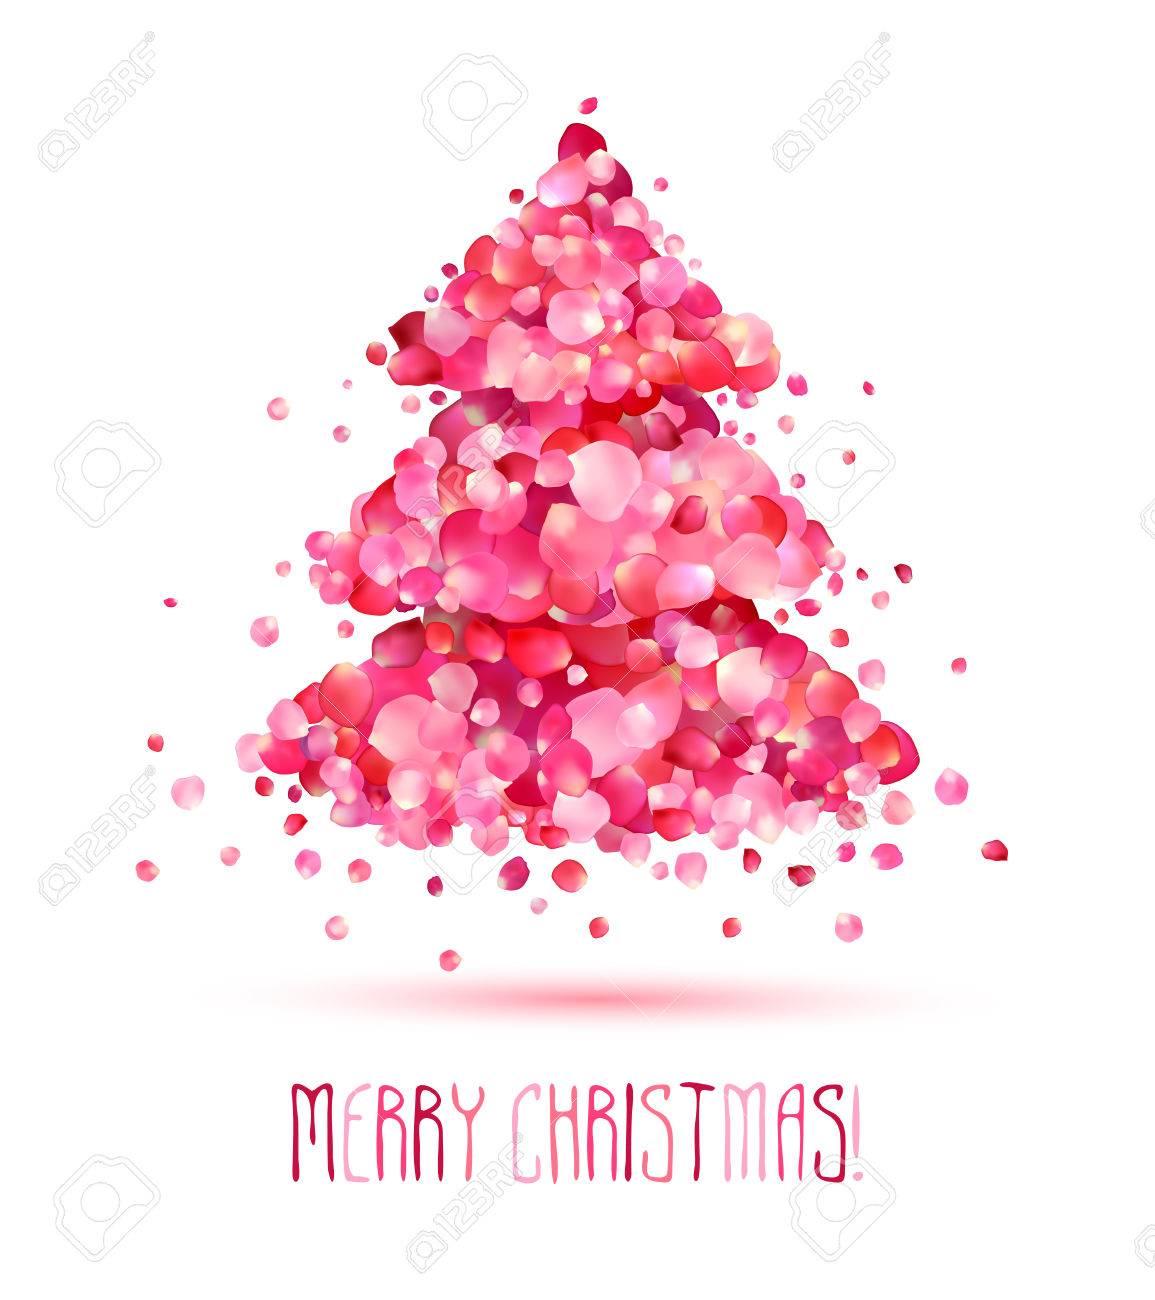 Christmas Beauty Salon.Beauty Salon Holiday Congratulation Card Christmas Tree Of Pink